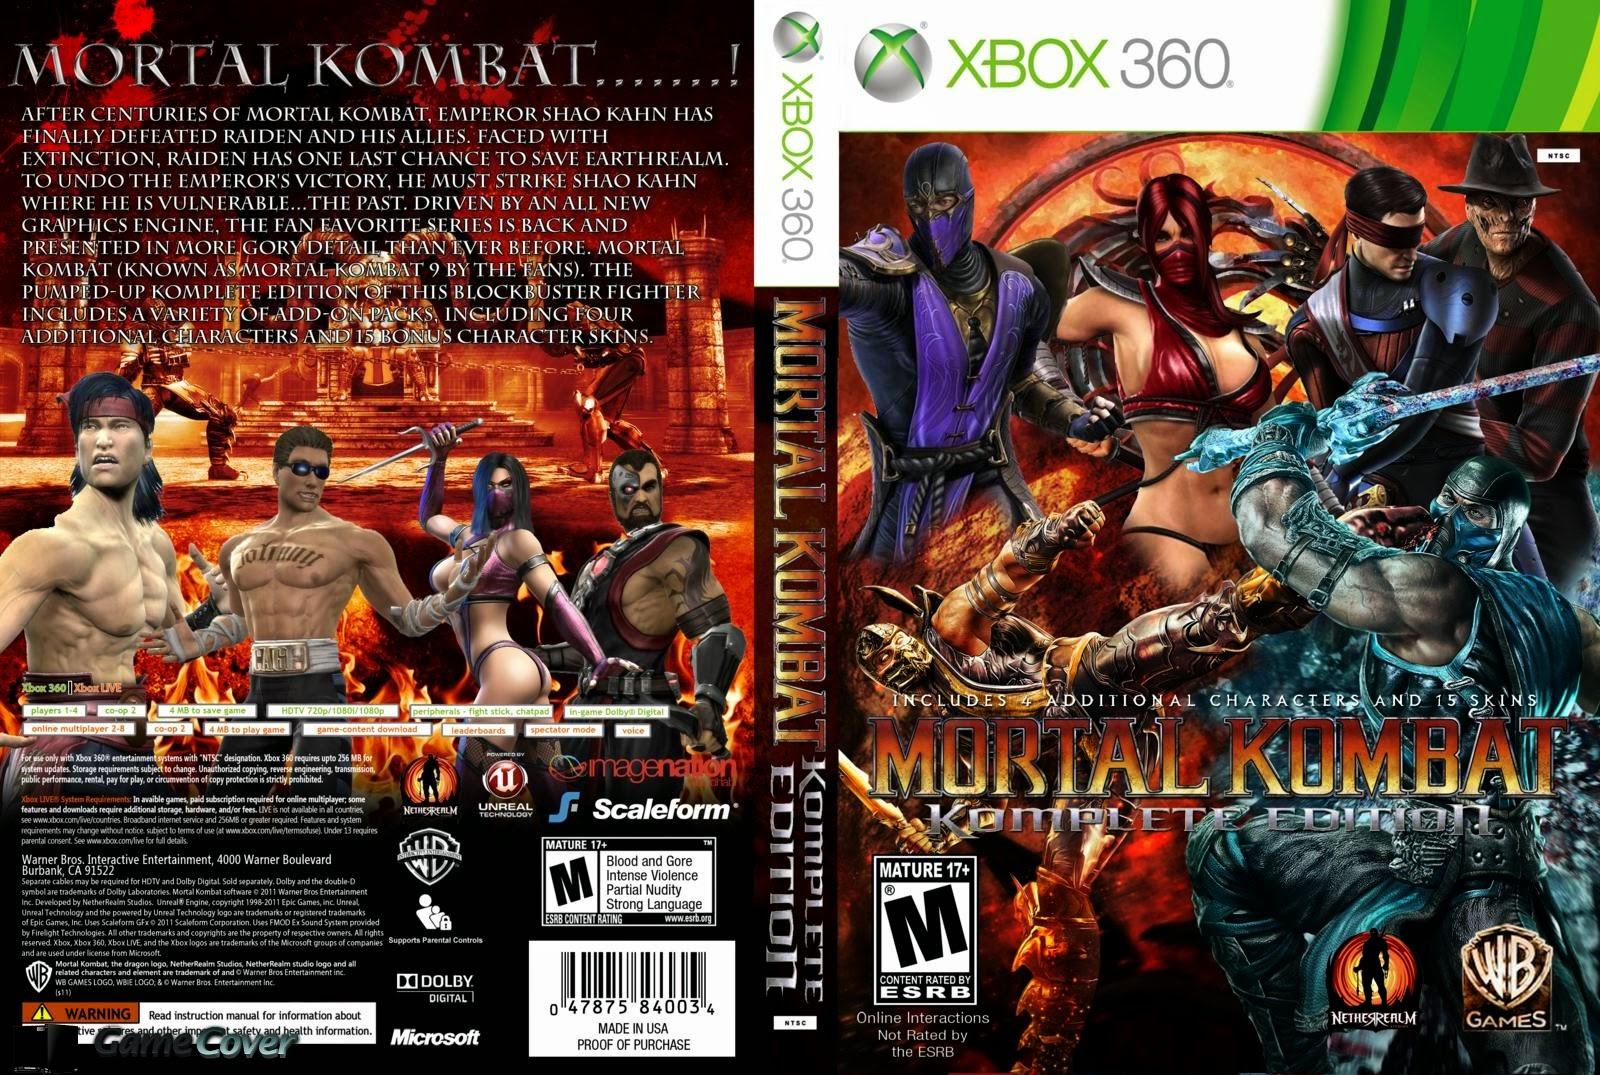 Xbox 360 mortal kombat nude mod anime video